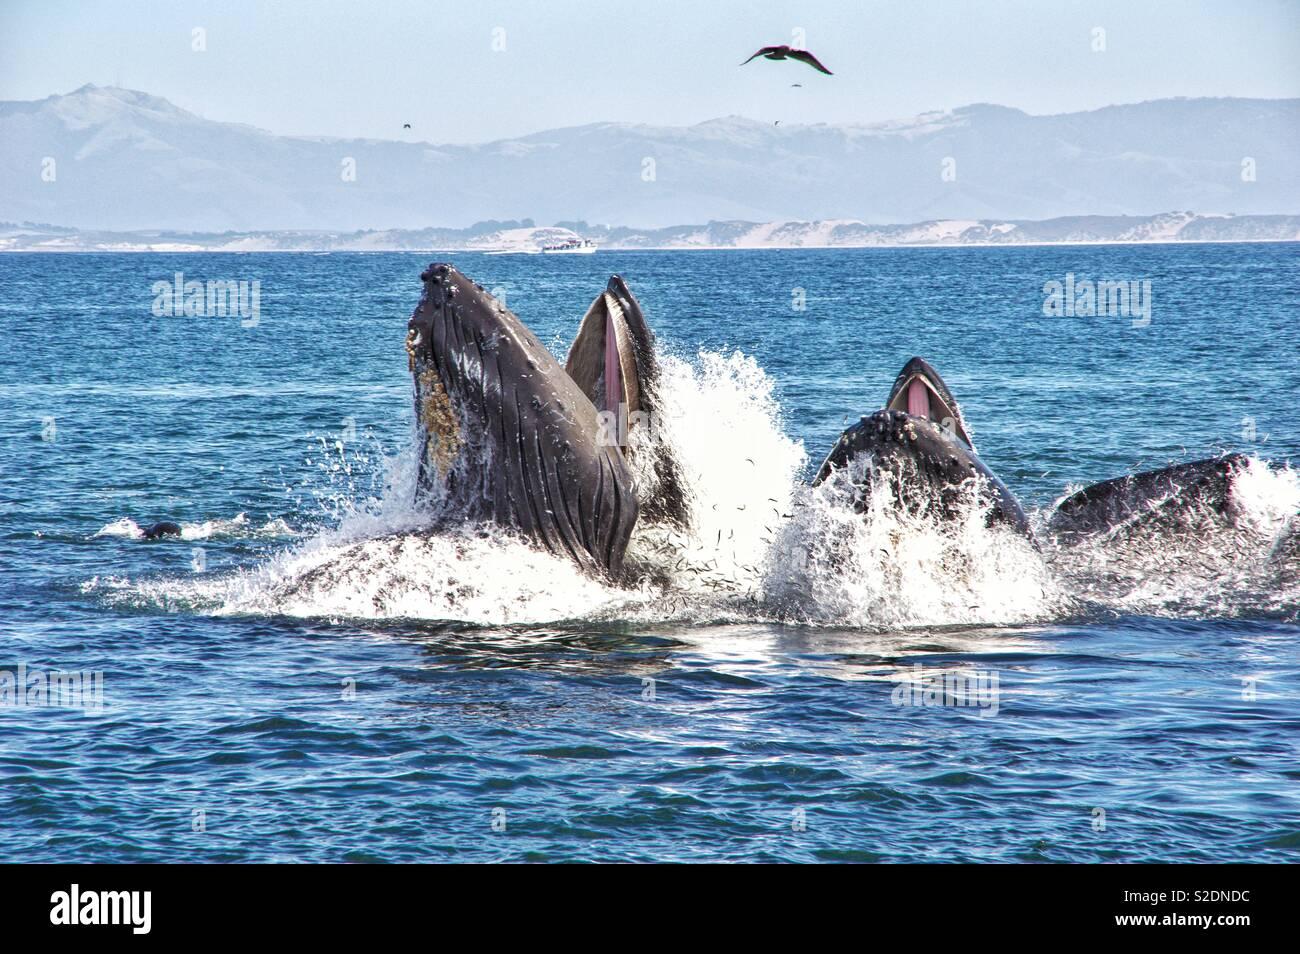 Humpback Whale Feeding - Stock Image